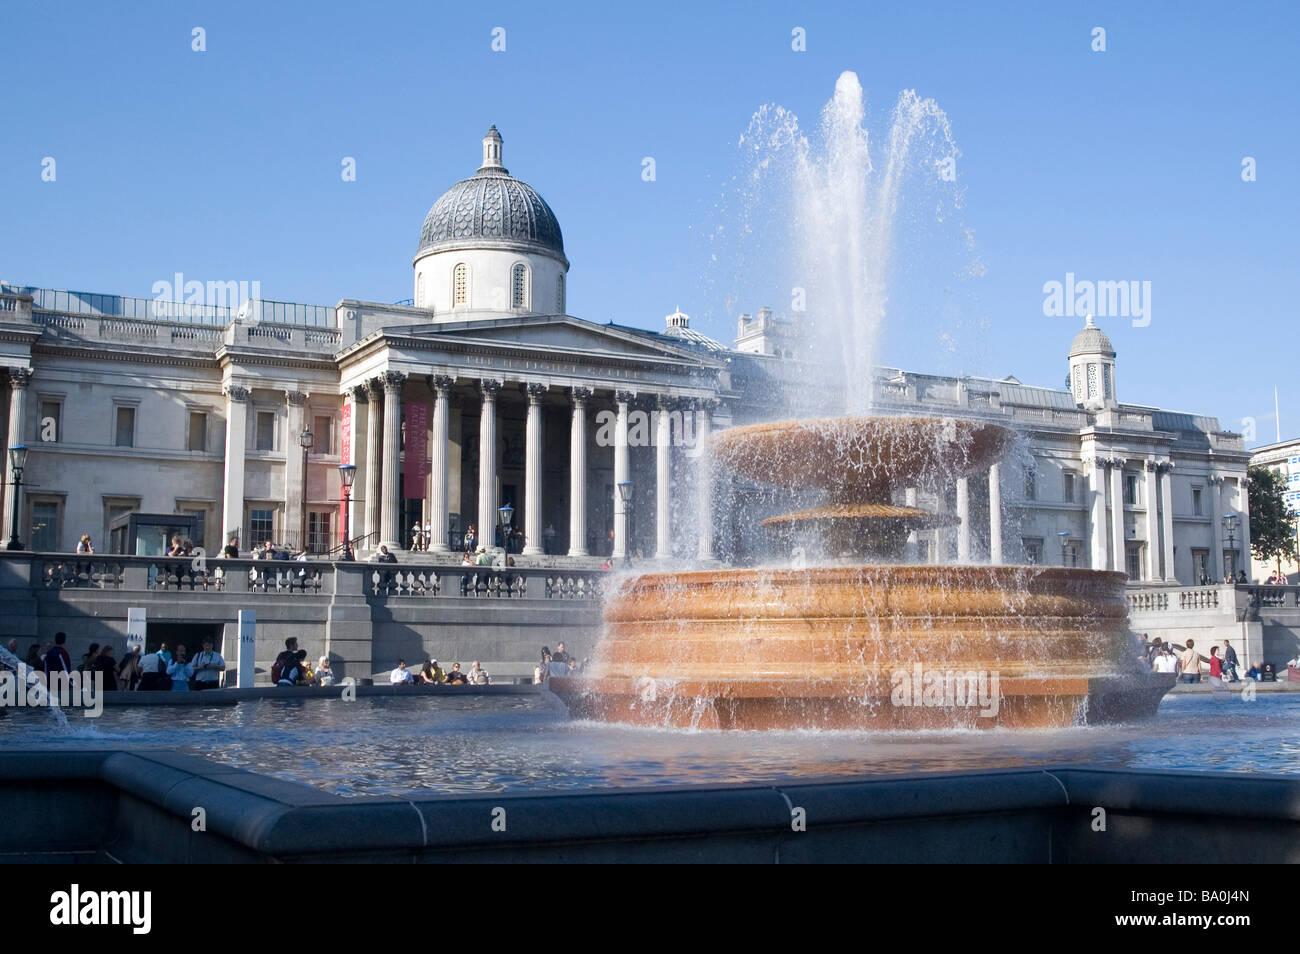 The National Art Gallery in Trafalgar Square London England - Stock Image